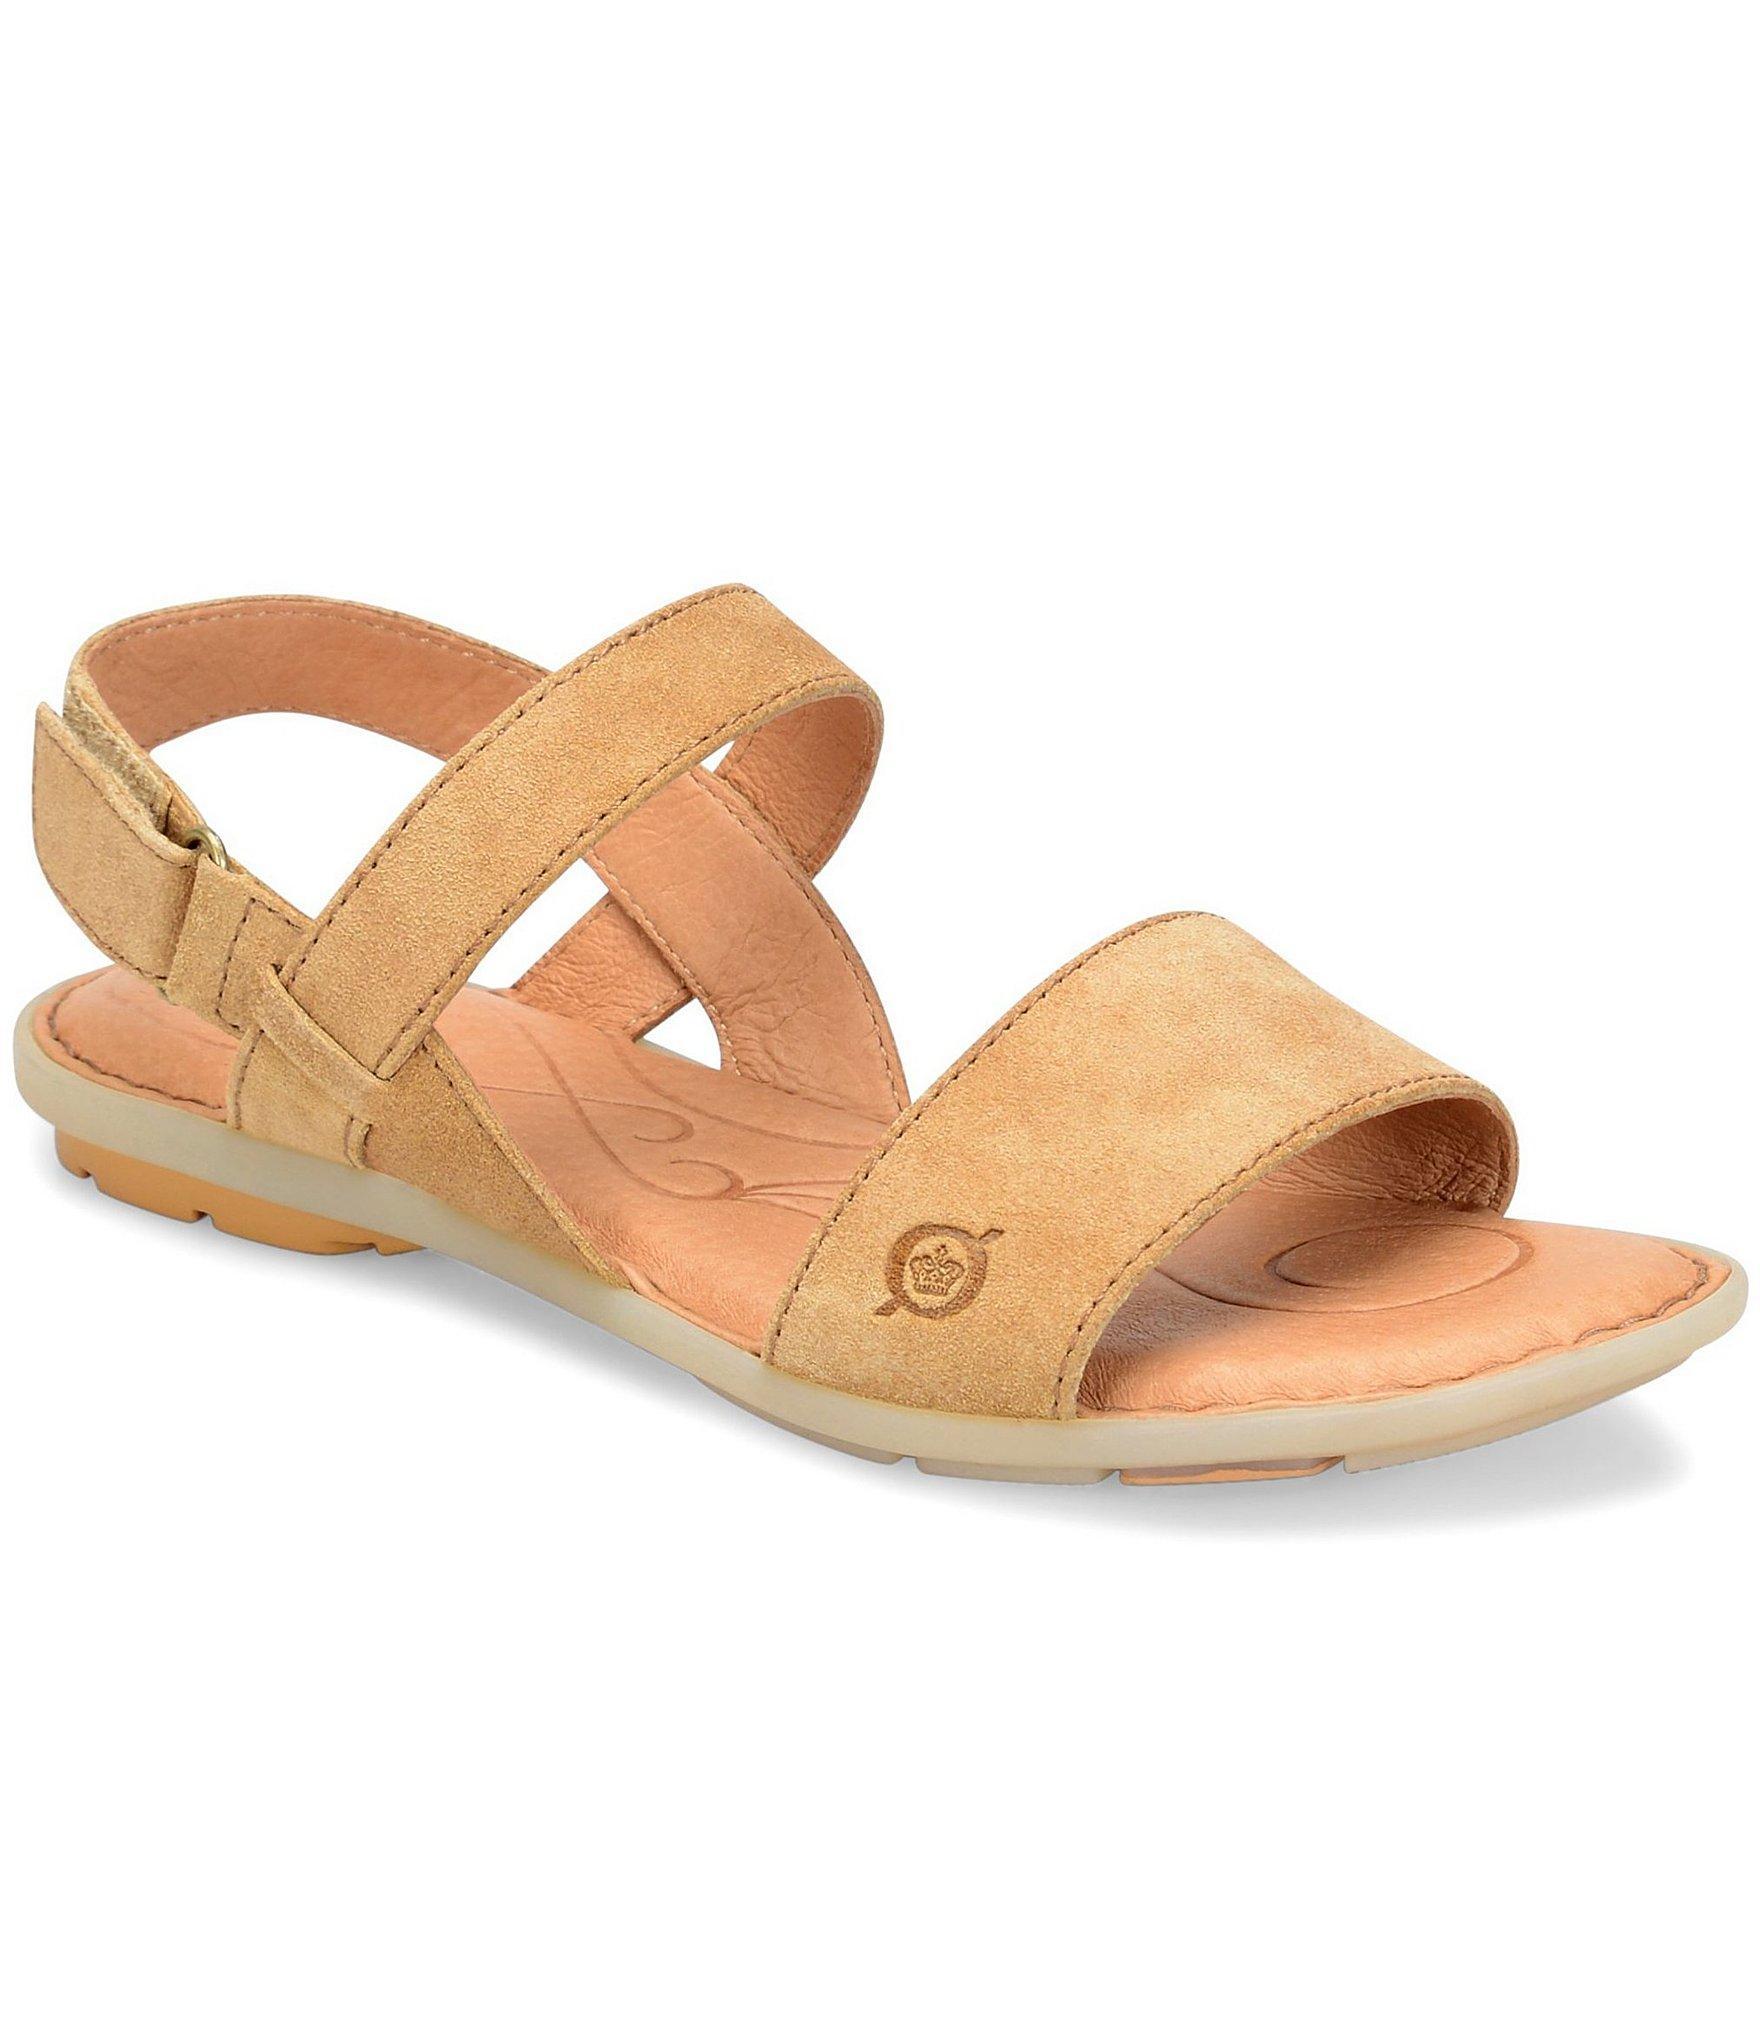 f8b95e27338a Lyst - Born Tagum Distressed Leather Sandals